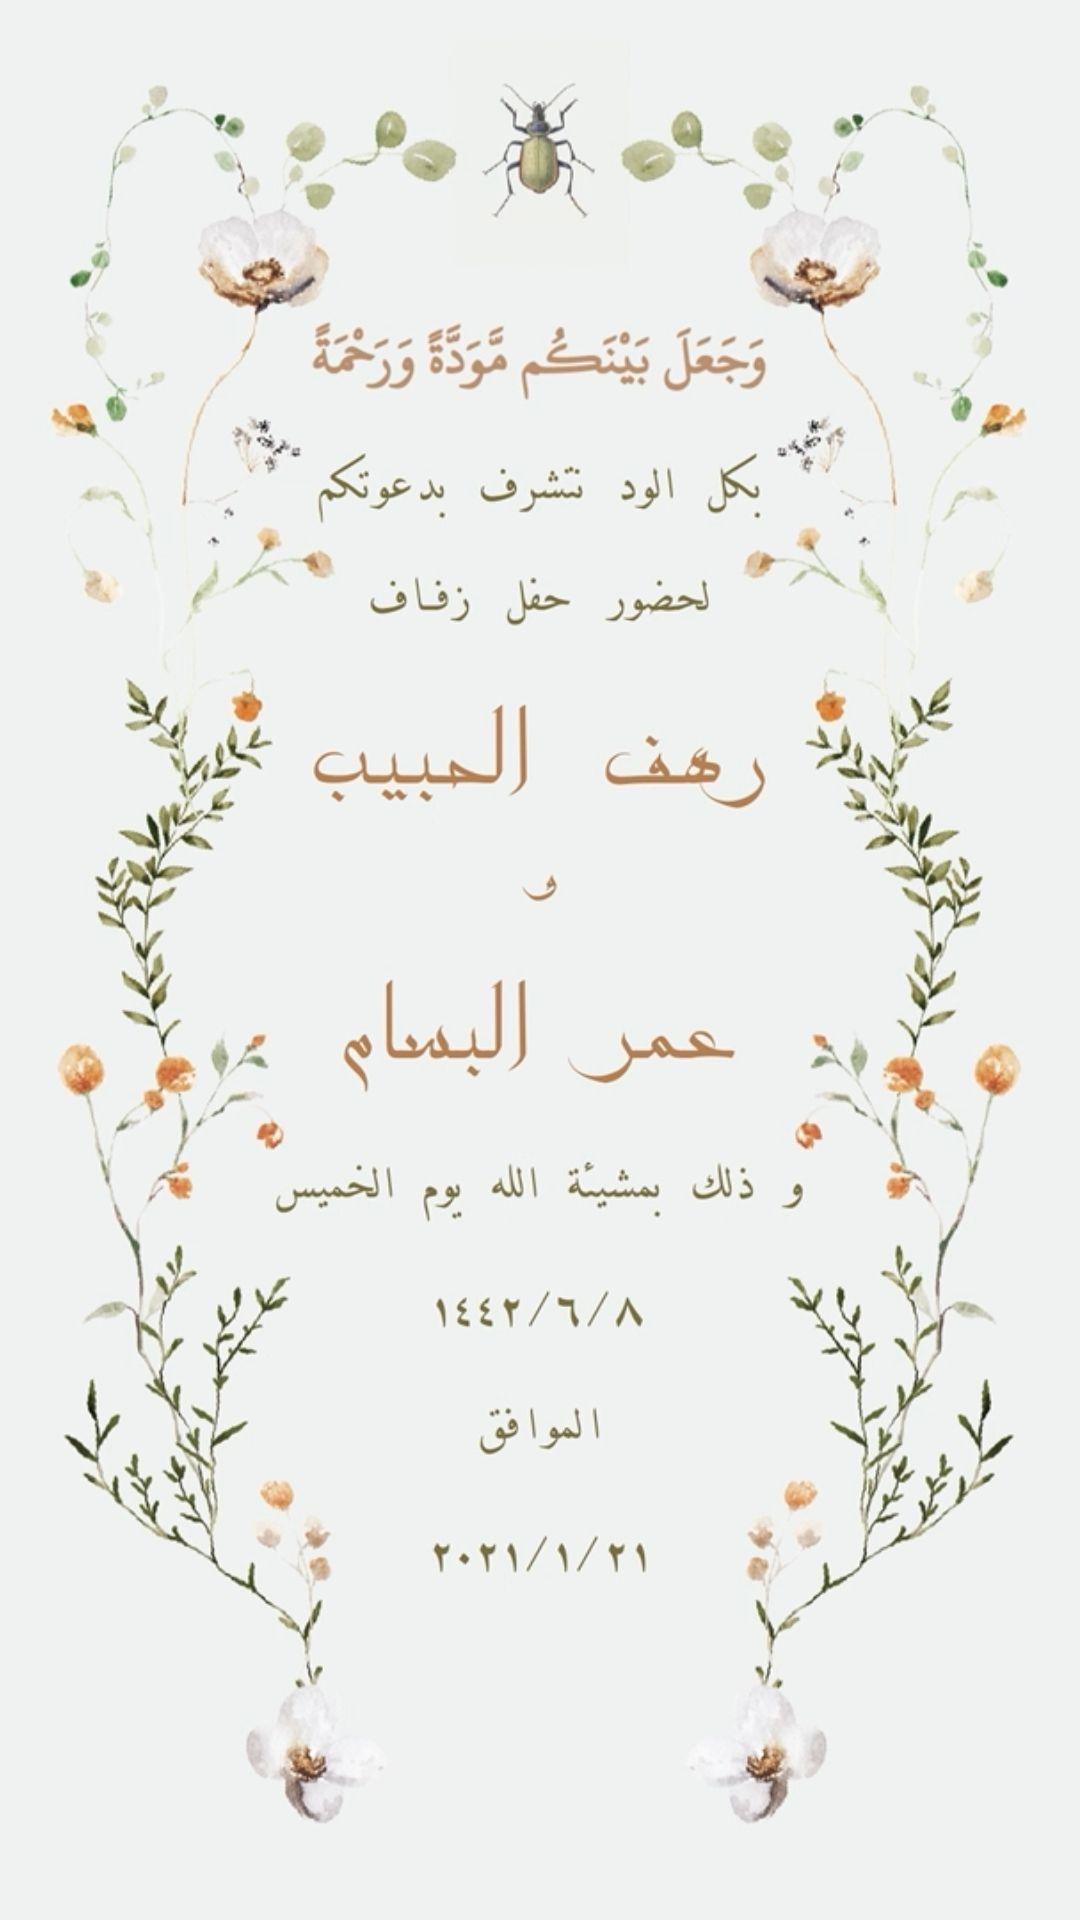 Garden Theme Floral Arabic Digital Video Invitation Motion Evite Animated Invitation An Immersive Guide By Ello Props